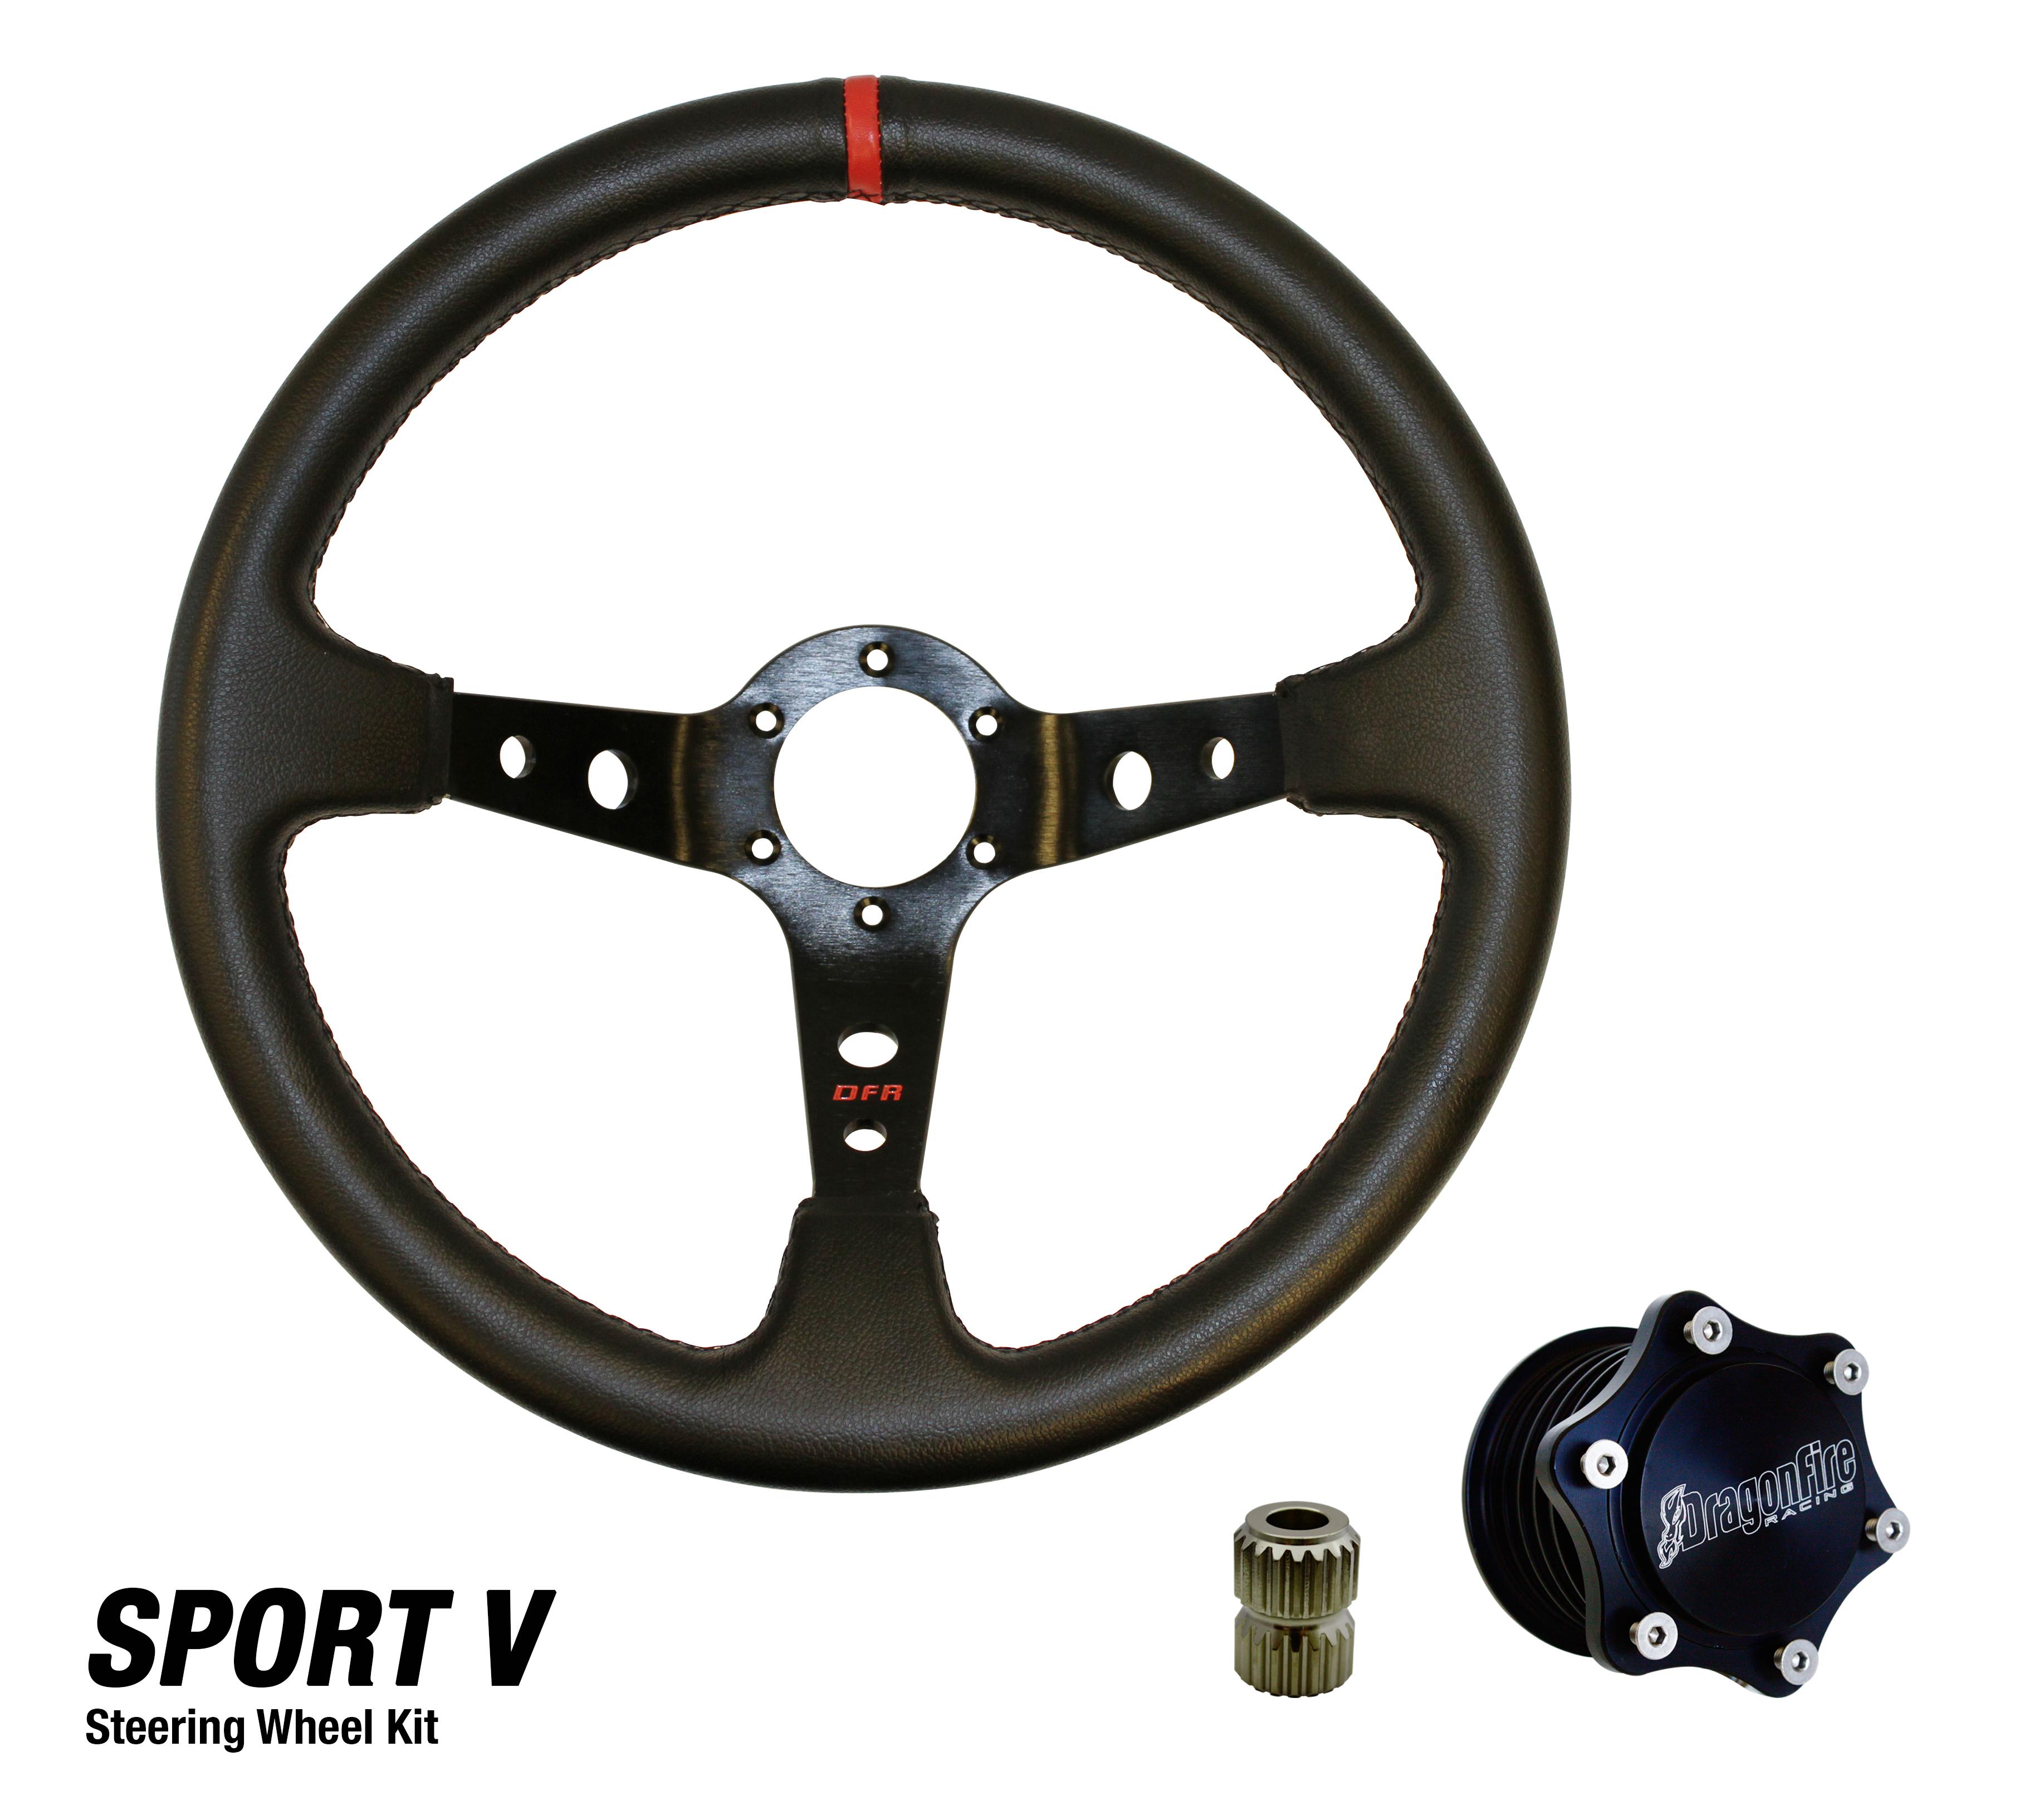 Images of Quick Release Steering Wheel